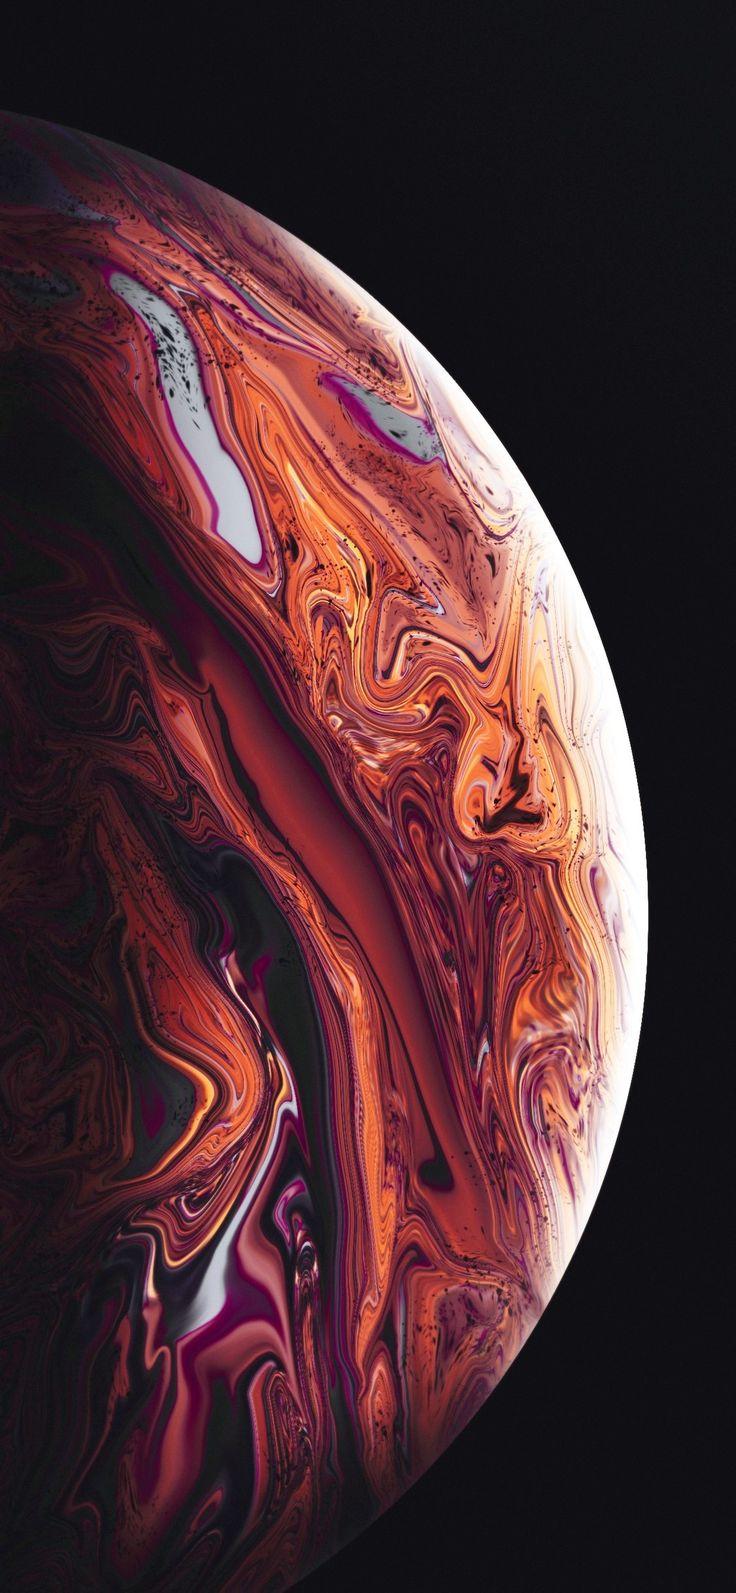 iPhone XS Wallpaper HD